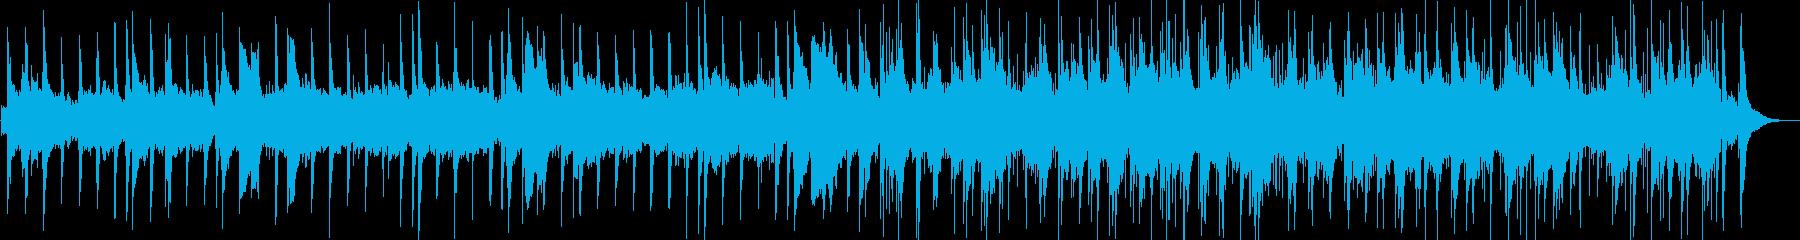 Amazing Grace バグパイプの再生済みの波形